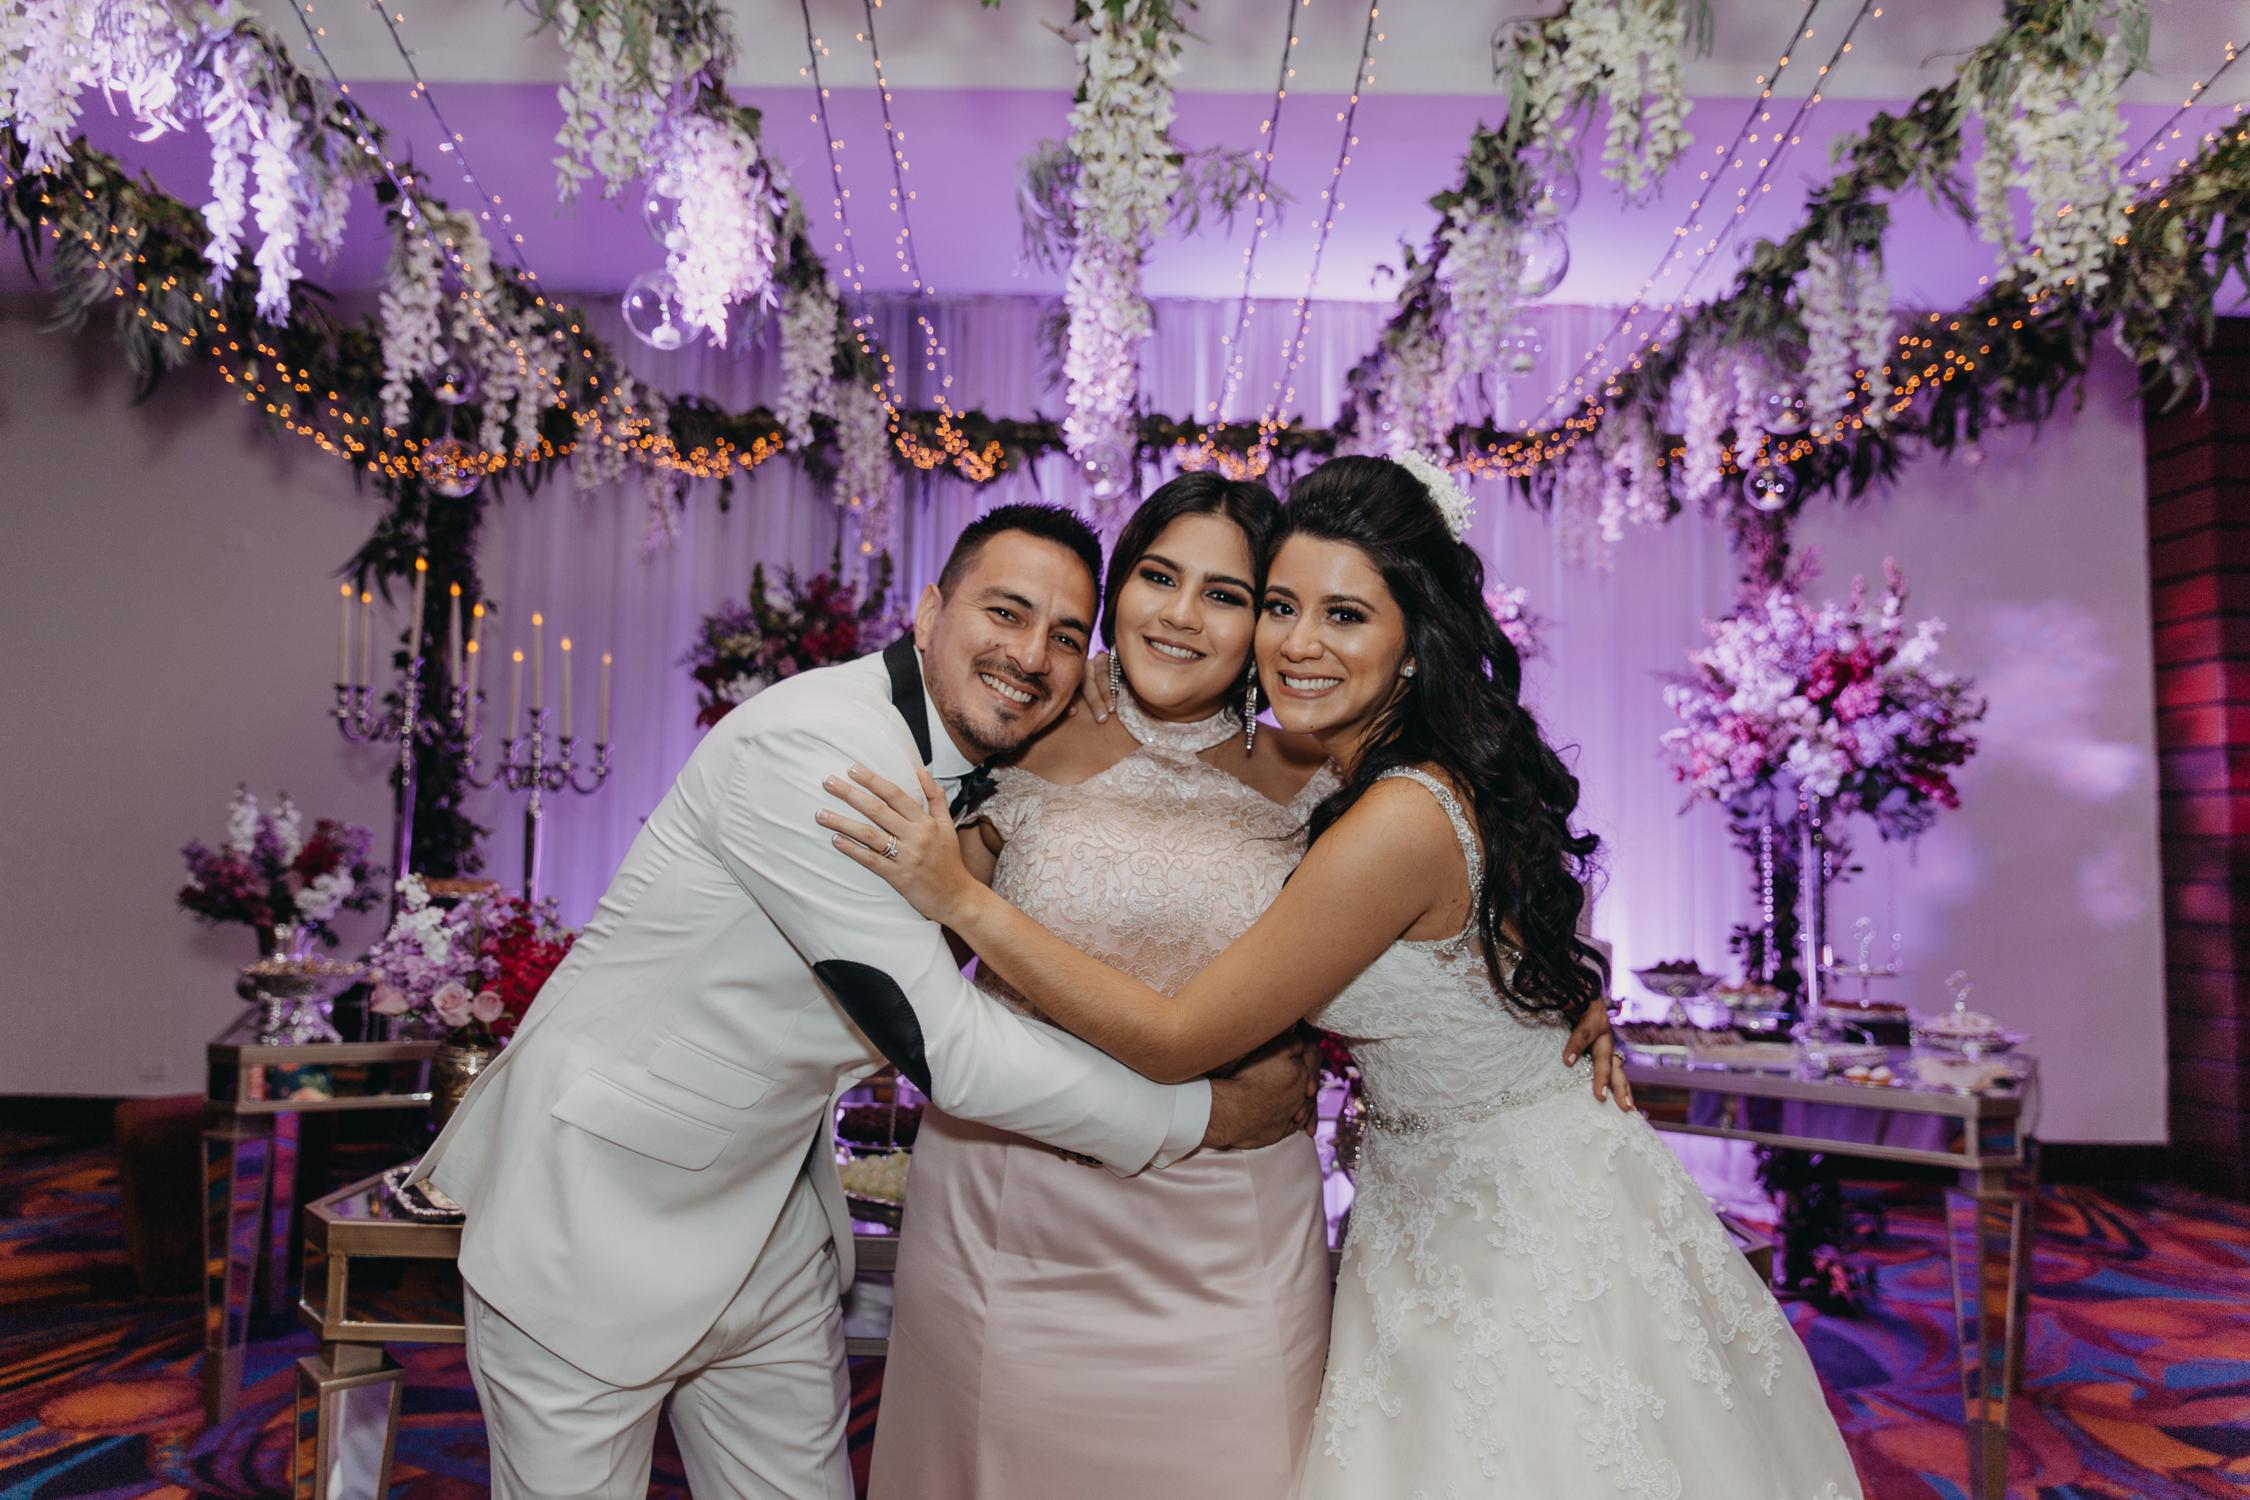 Michelle-Agurto-Fotografia-Bodas-Ecuador-Destination-Wedding-Photographer-Daniela-Dirk-64.JPG